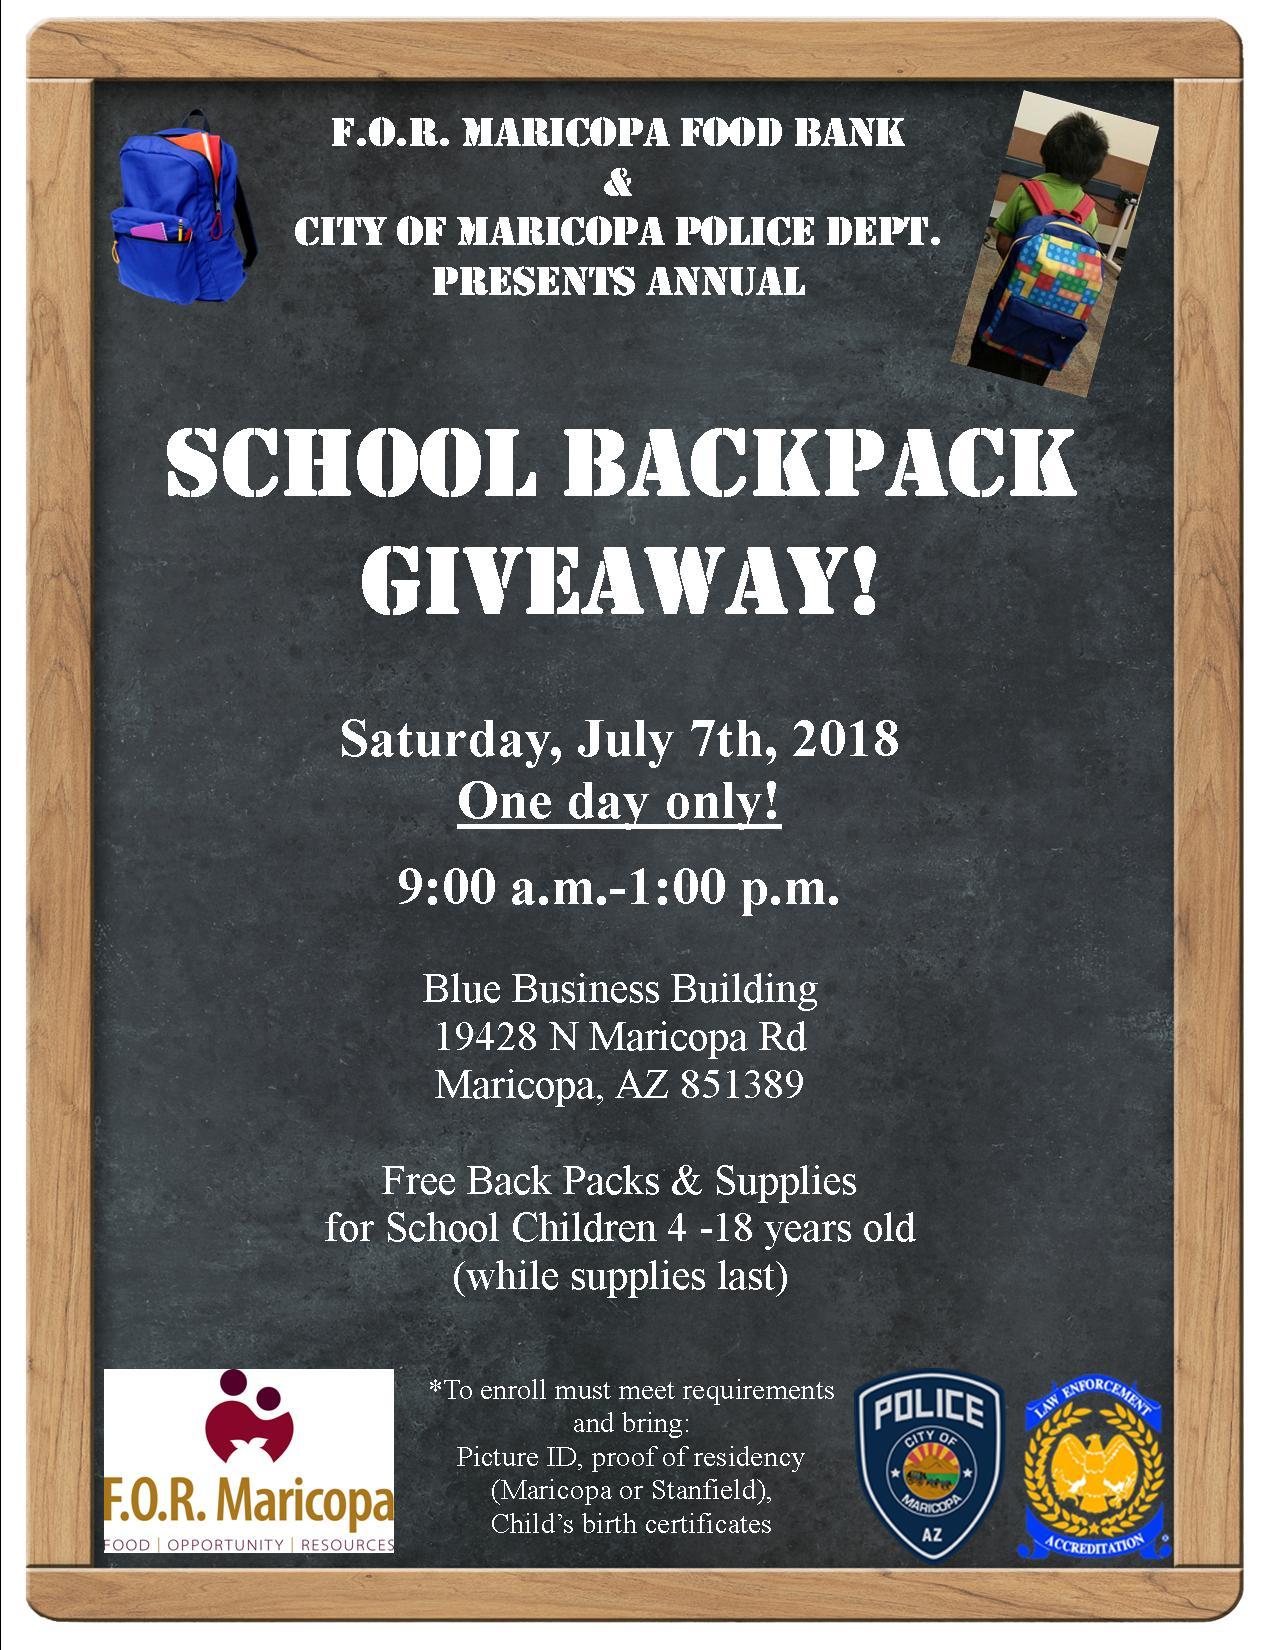 school backpack giveaway f o r maricopa